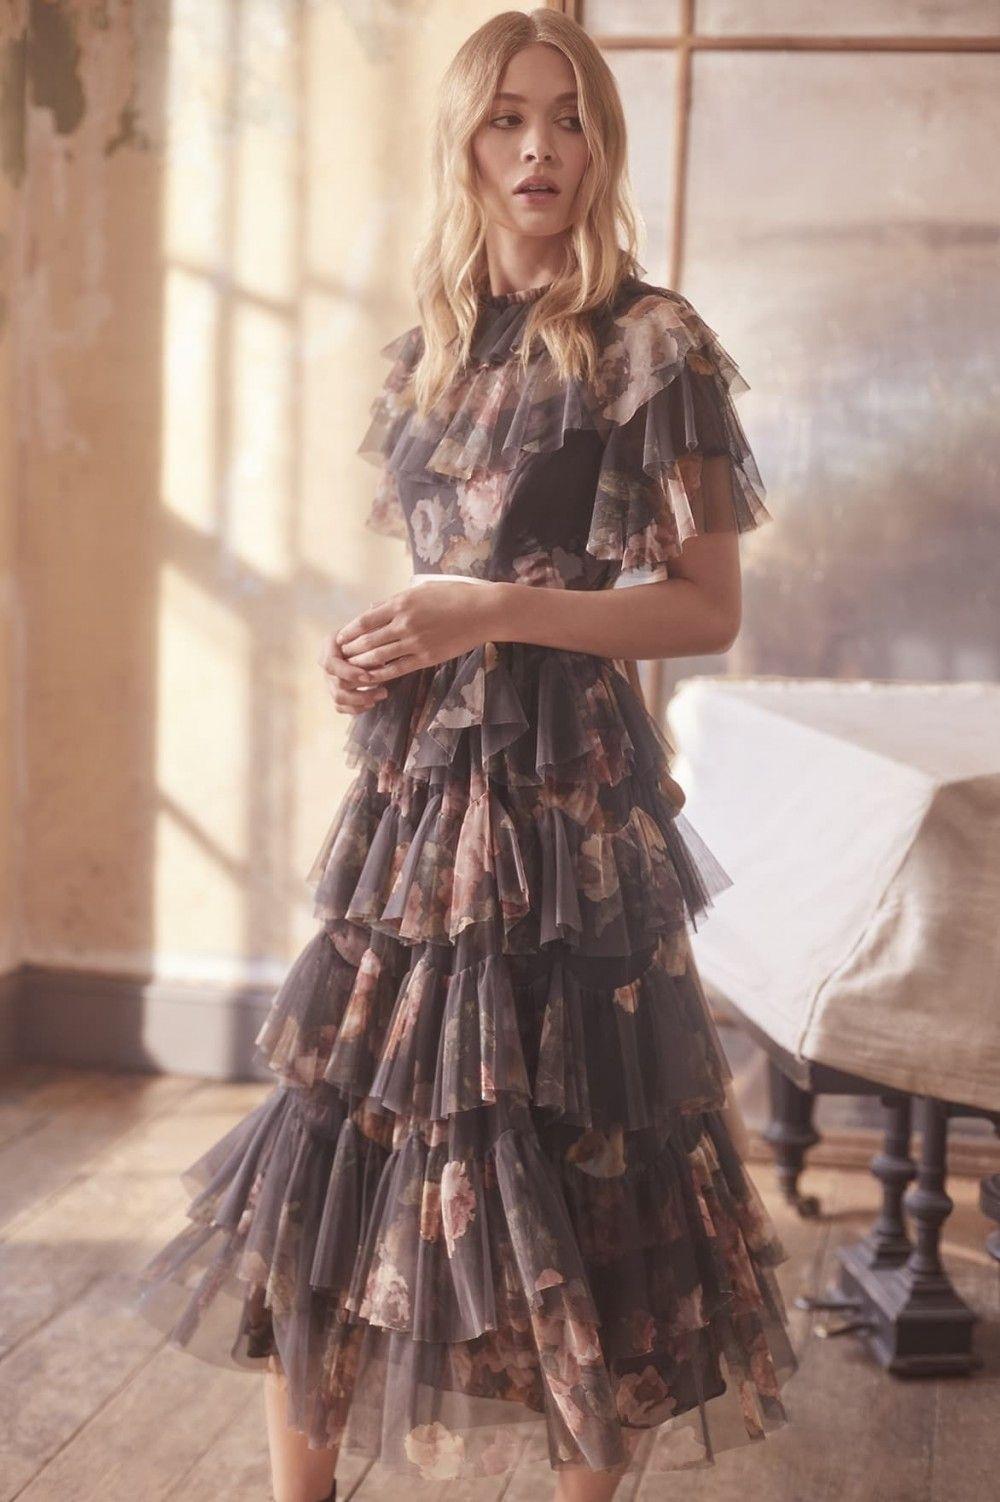 Tulle Needleamp; Ps19 Dress The Venetian Rose In Graphite From Thread TFK1lJc